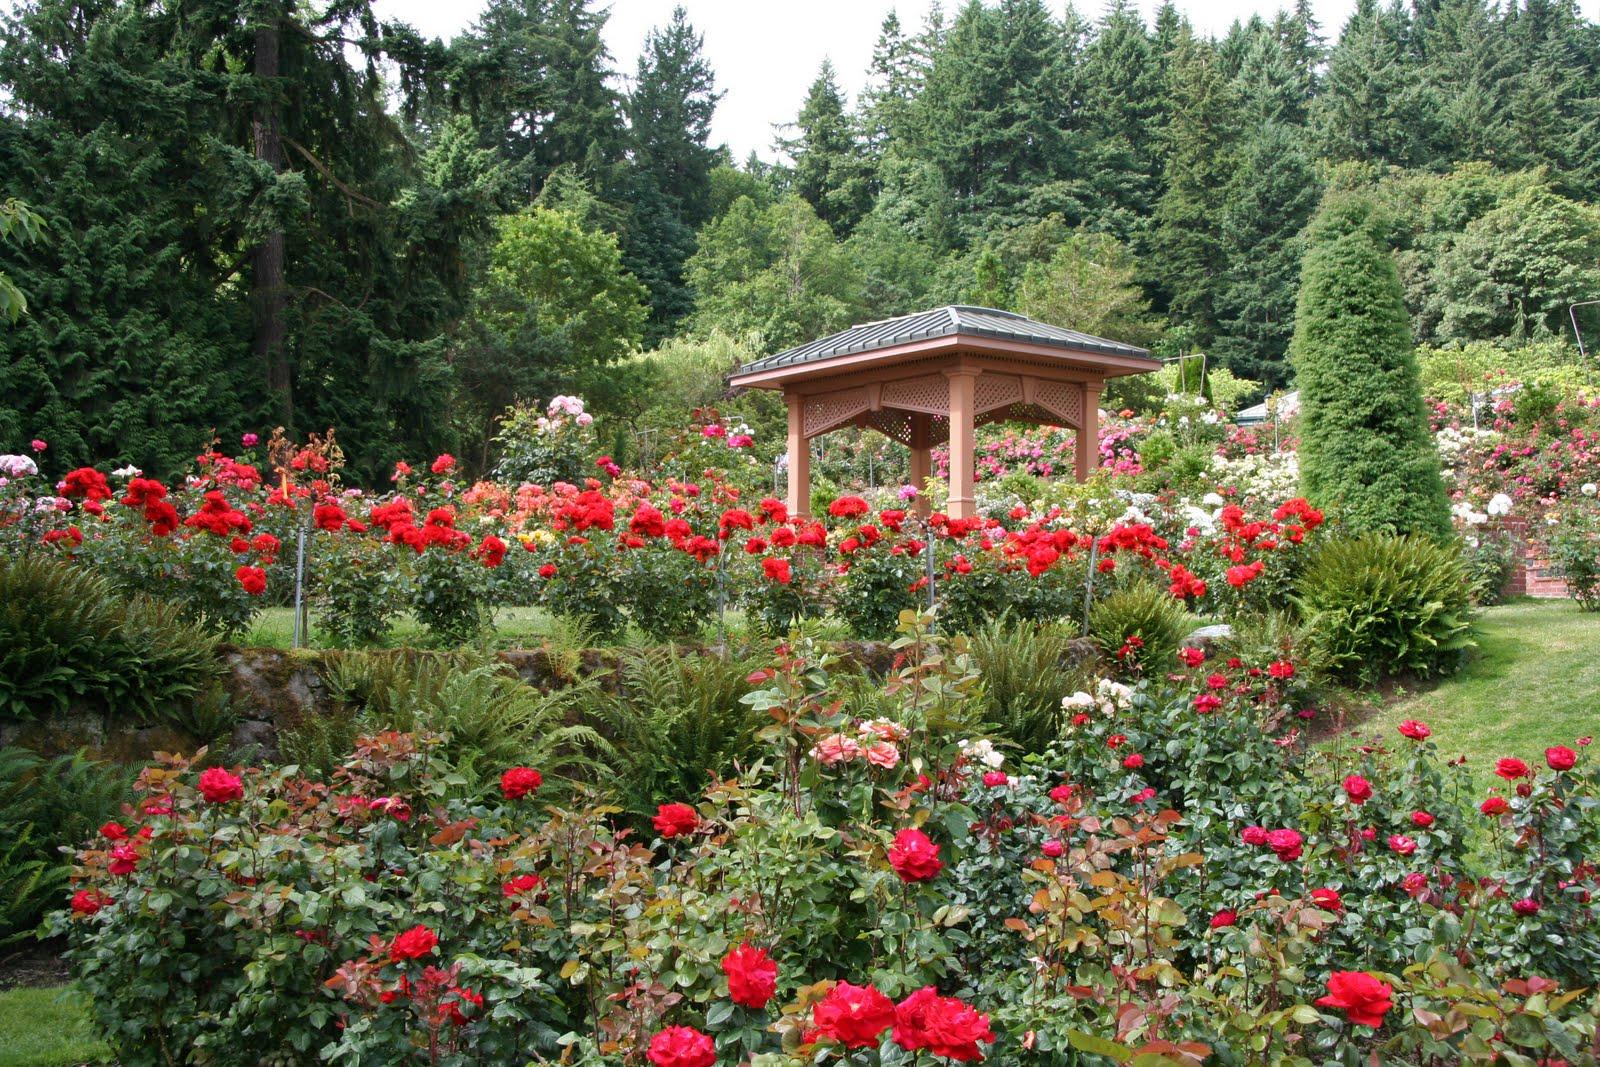 Daffodils Daydreams Garden Visit International Rose Test